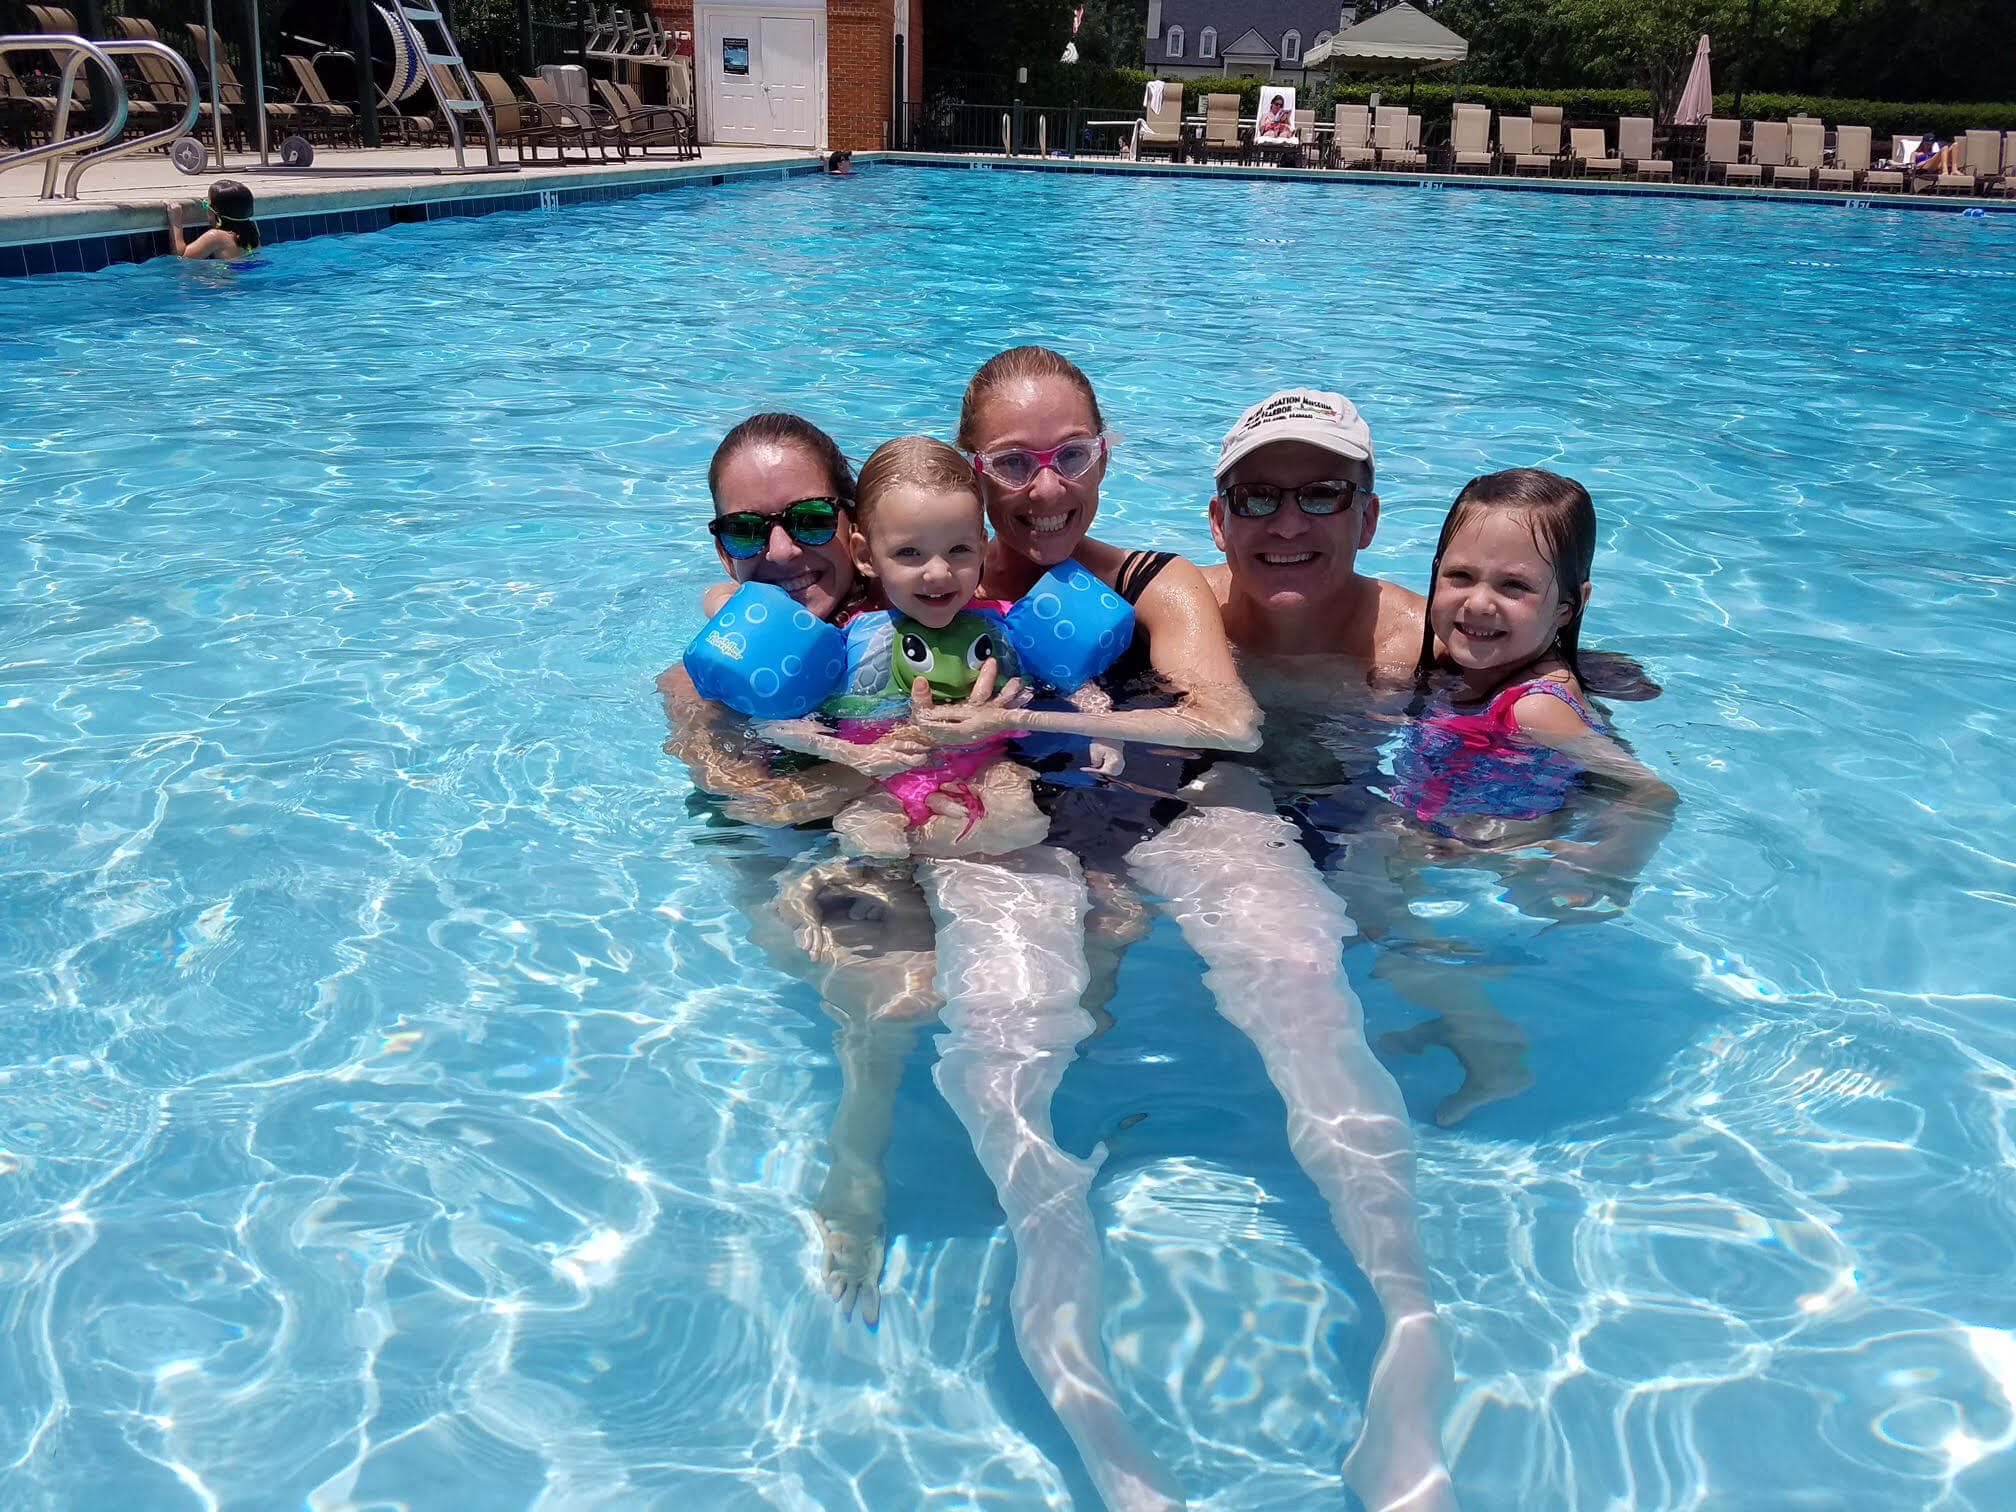 swim4 - Splashing Back into the Water: How I was going to swim again as a C6 quadriplegic